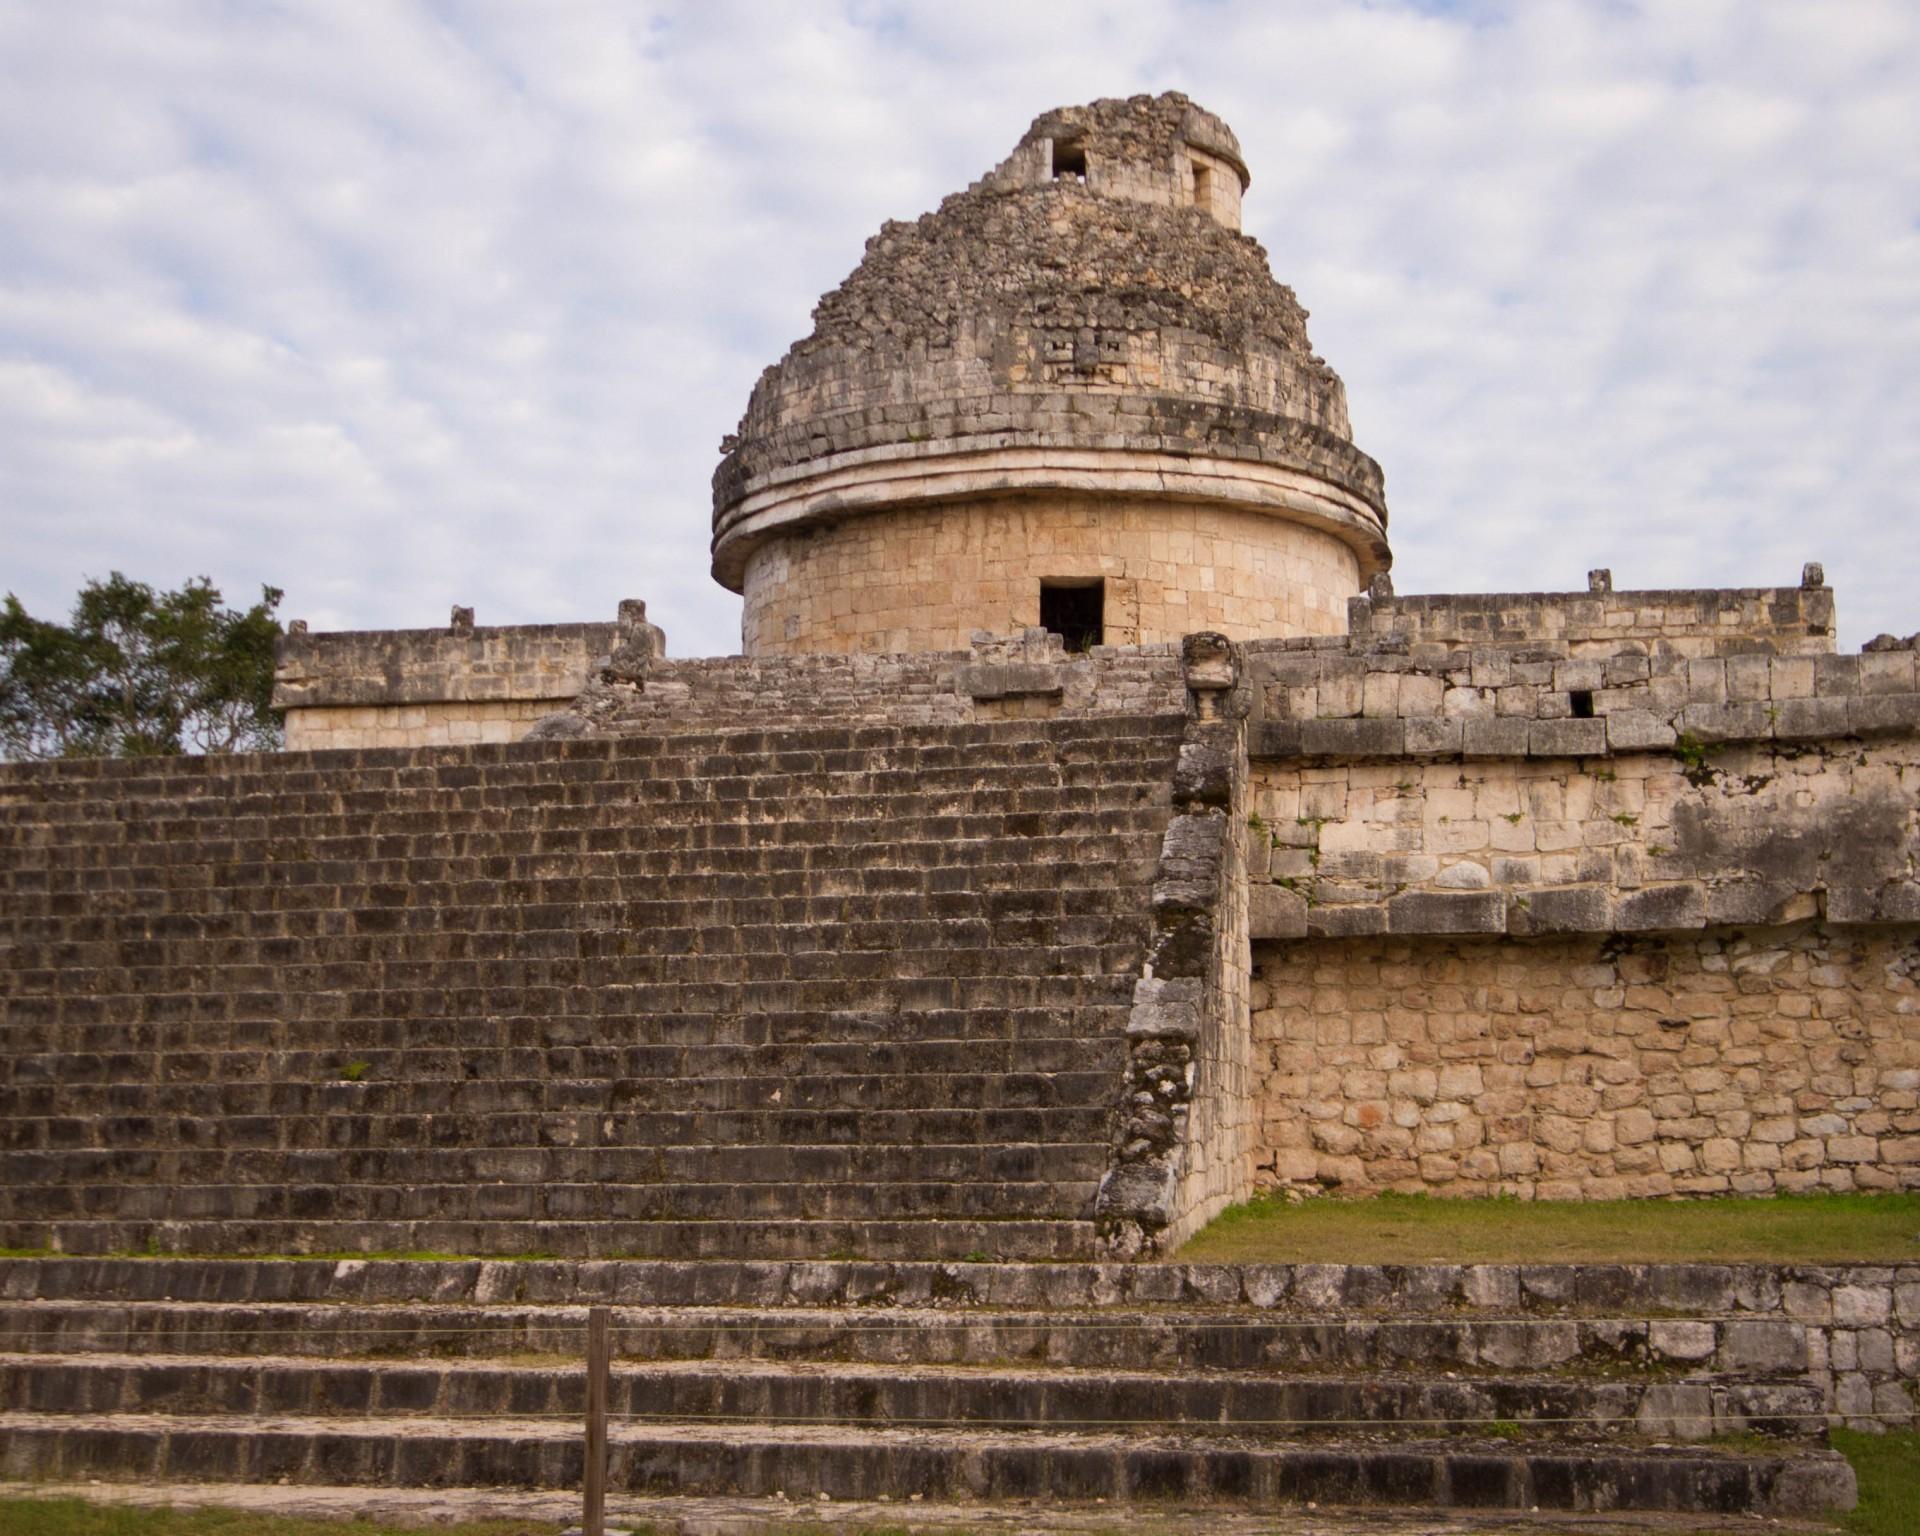 Chichen Itza - The Observatory